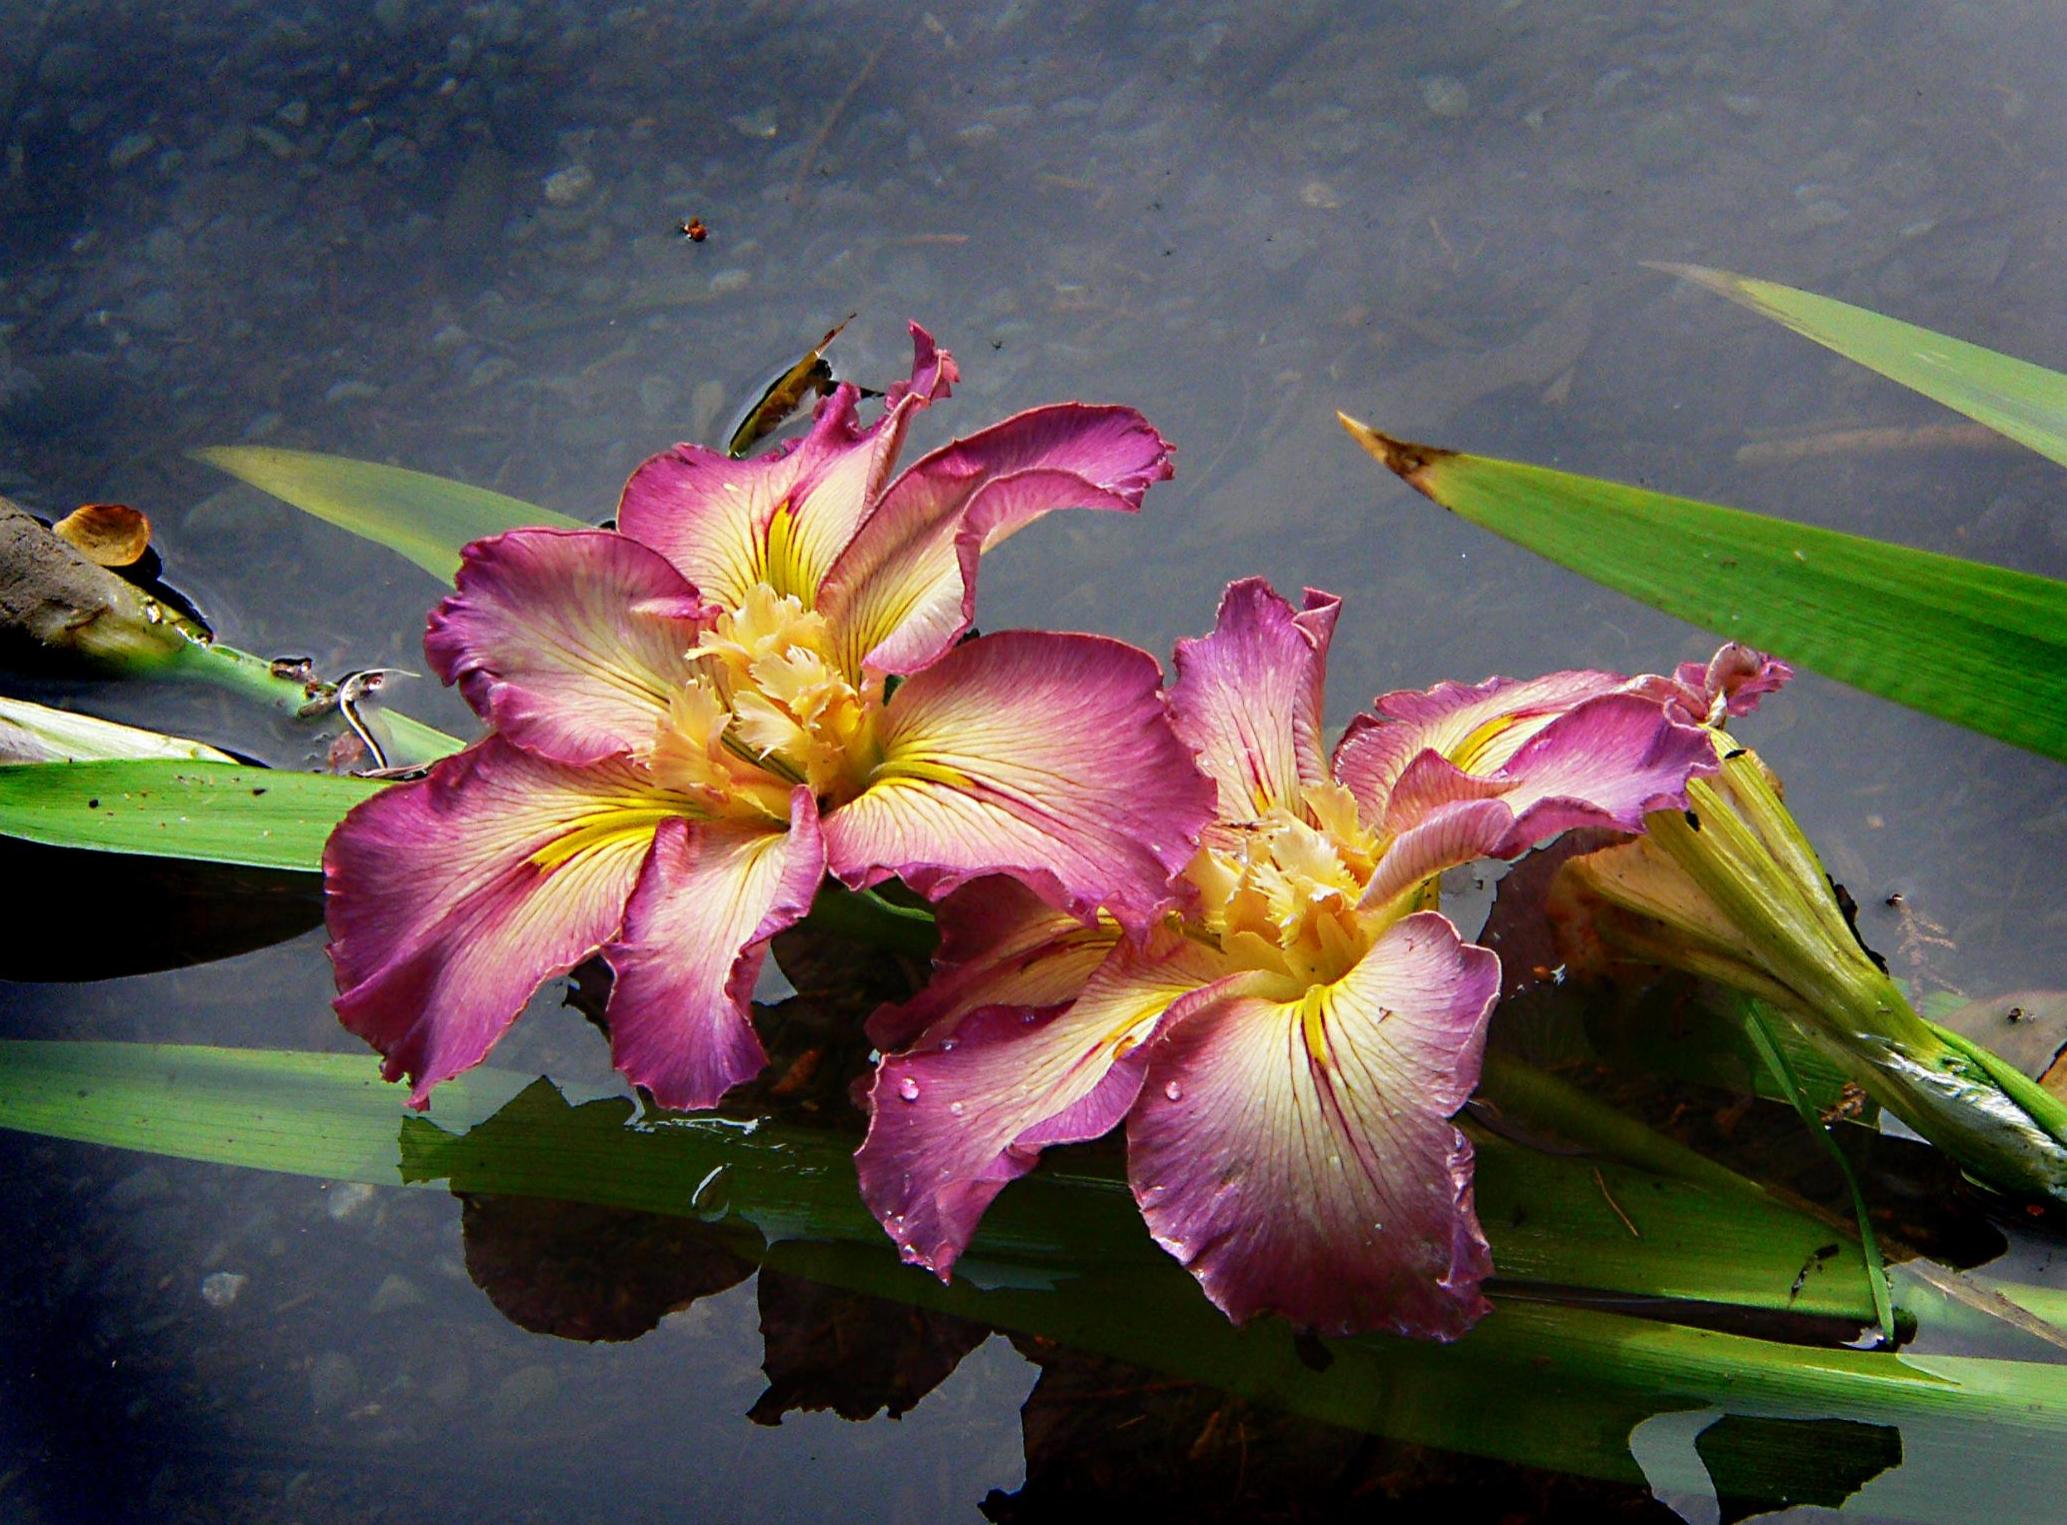 Fotos Gratis Flor Hoja Petalo Botanica Flora Flores Iris